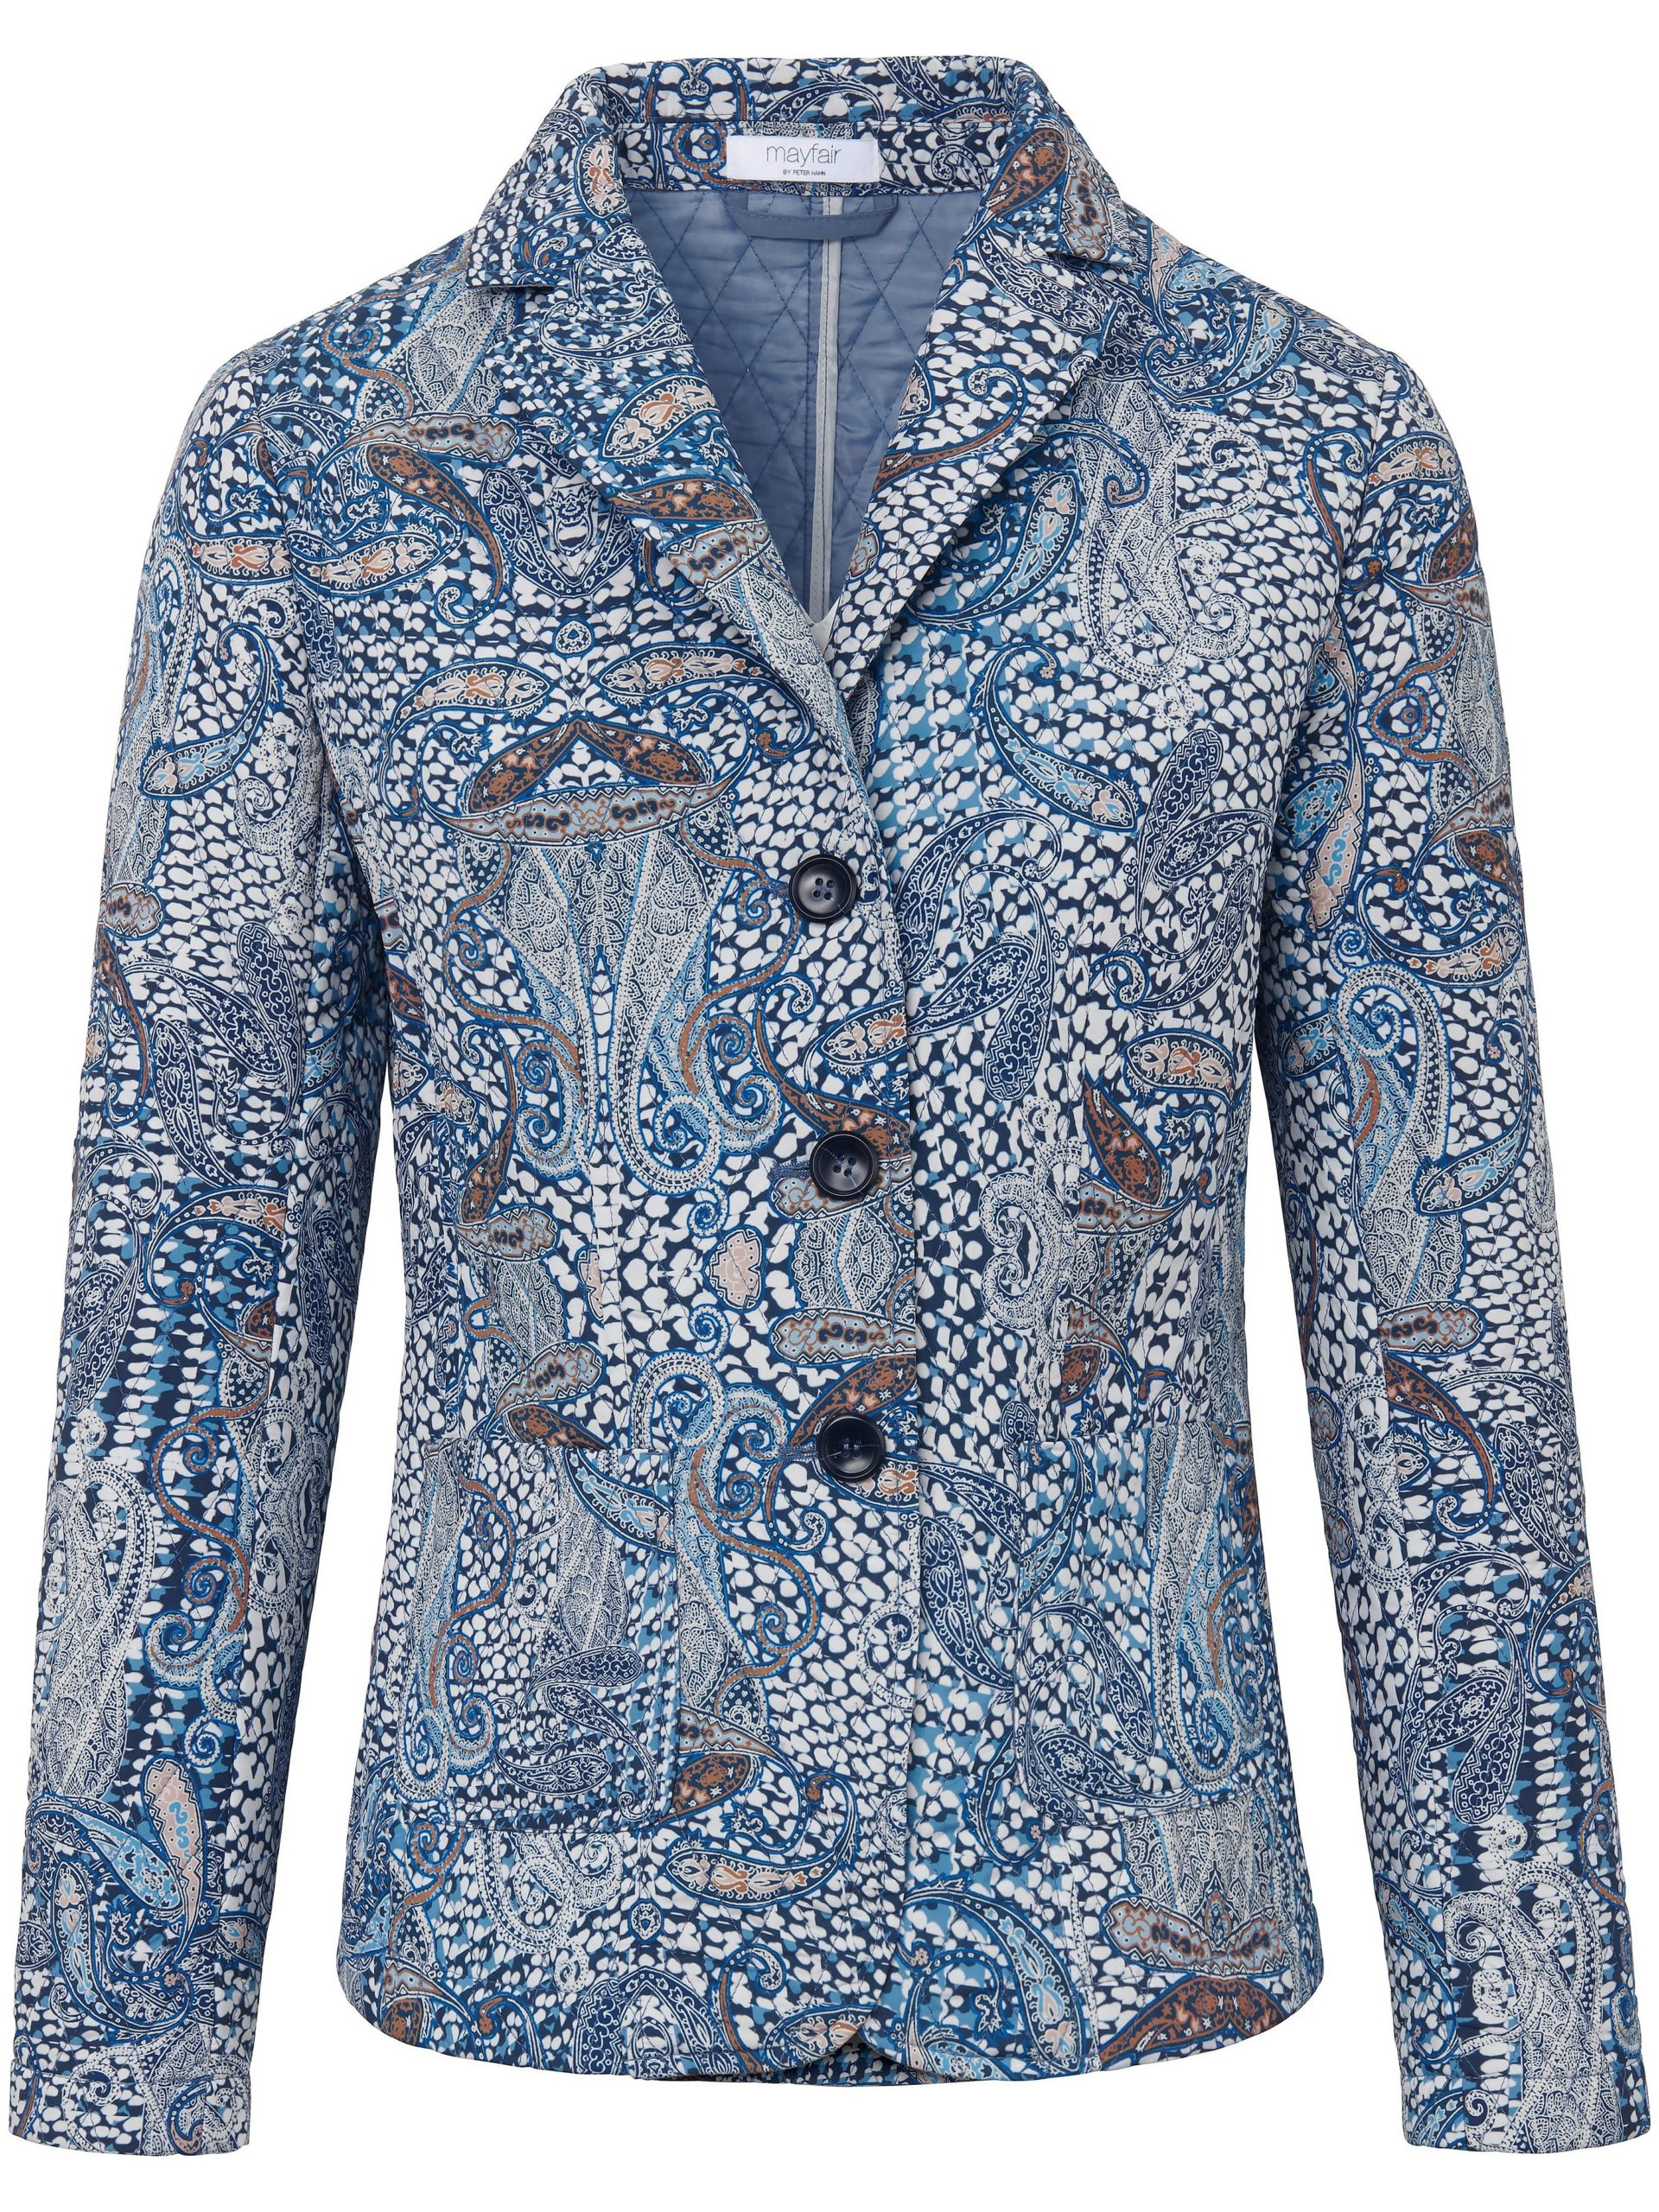 Gewatteerde blazer met print Van mayfair by Peter Hahn multicolour Kopen